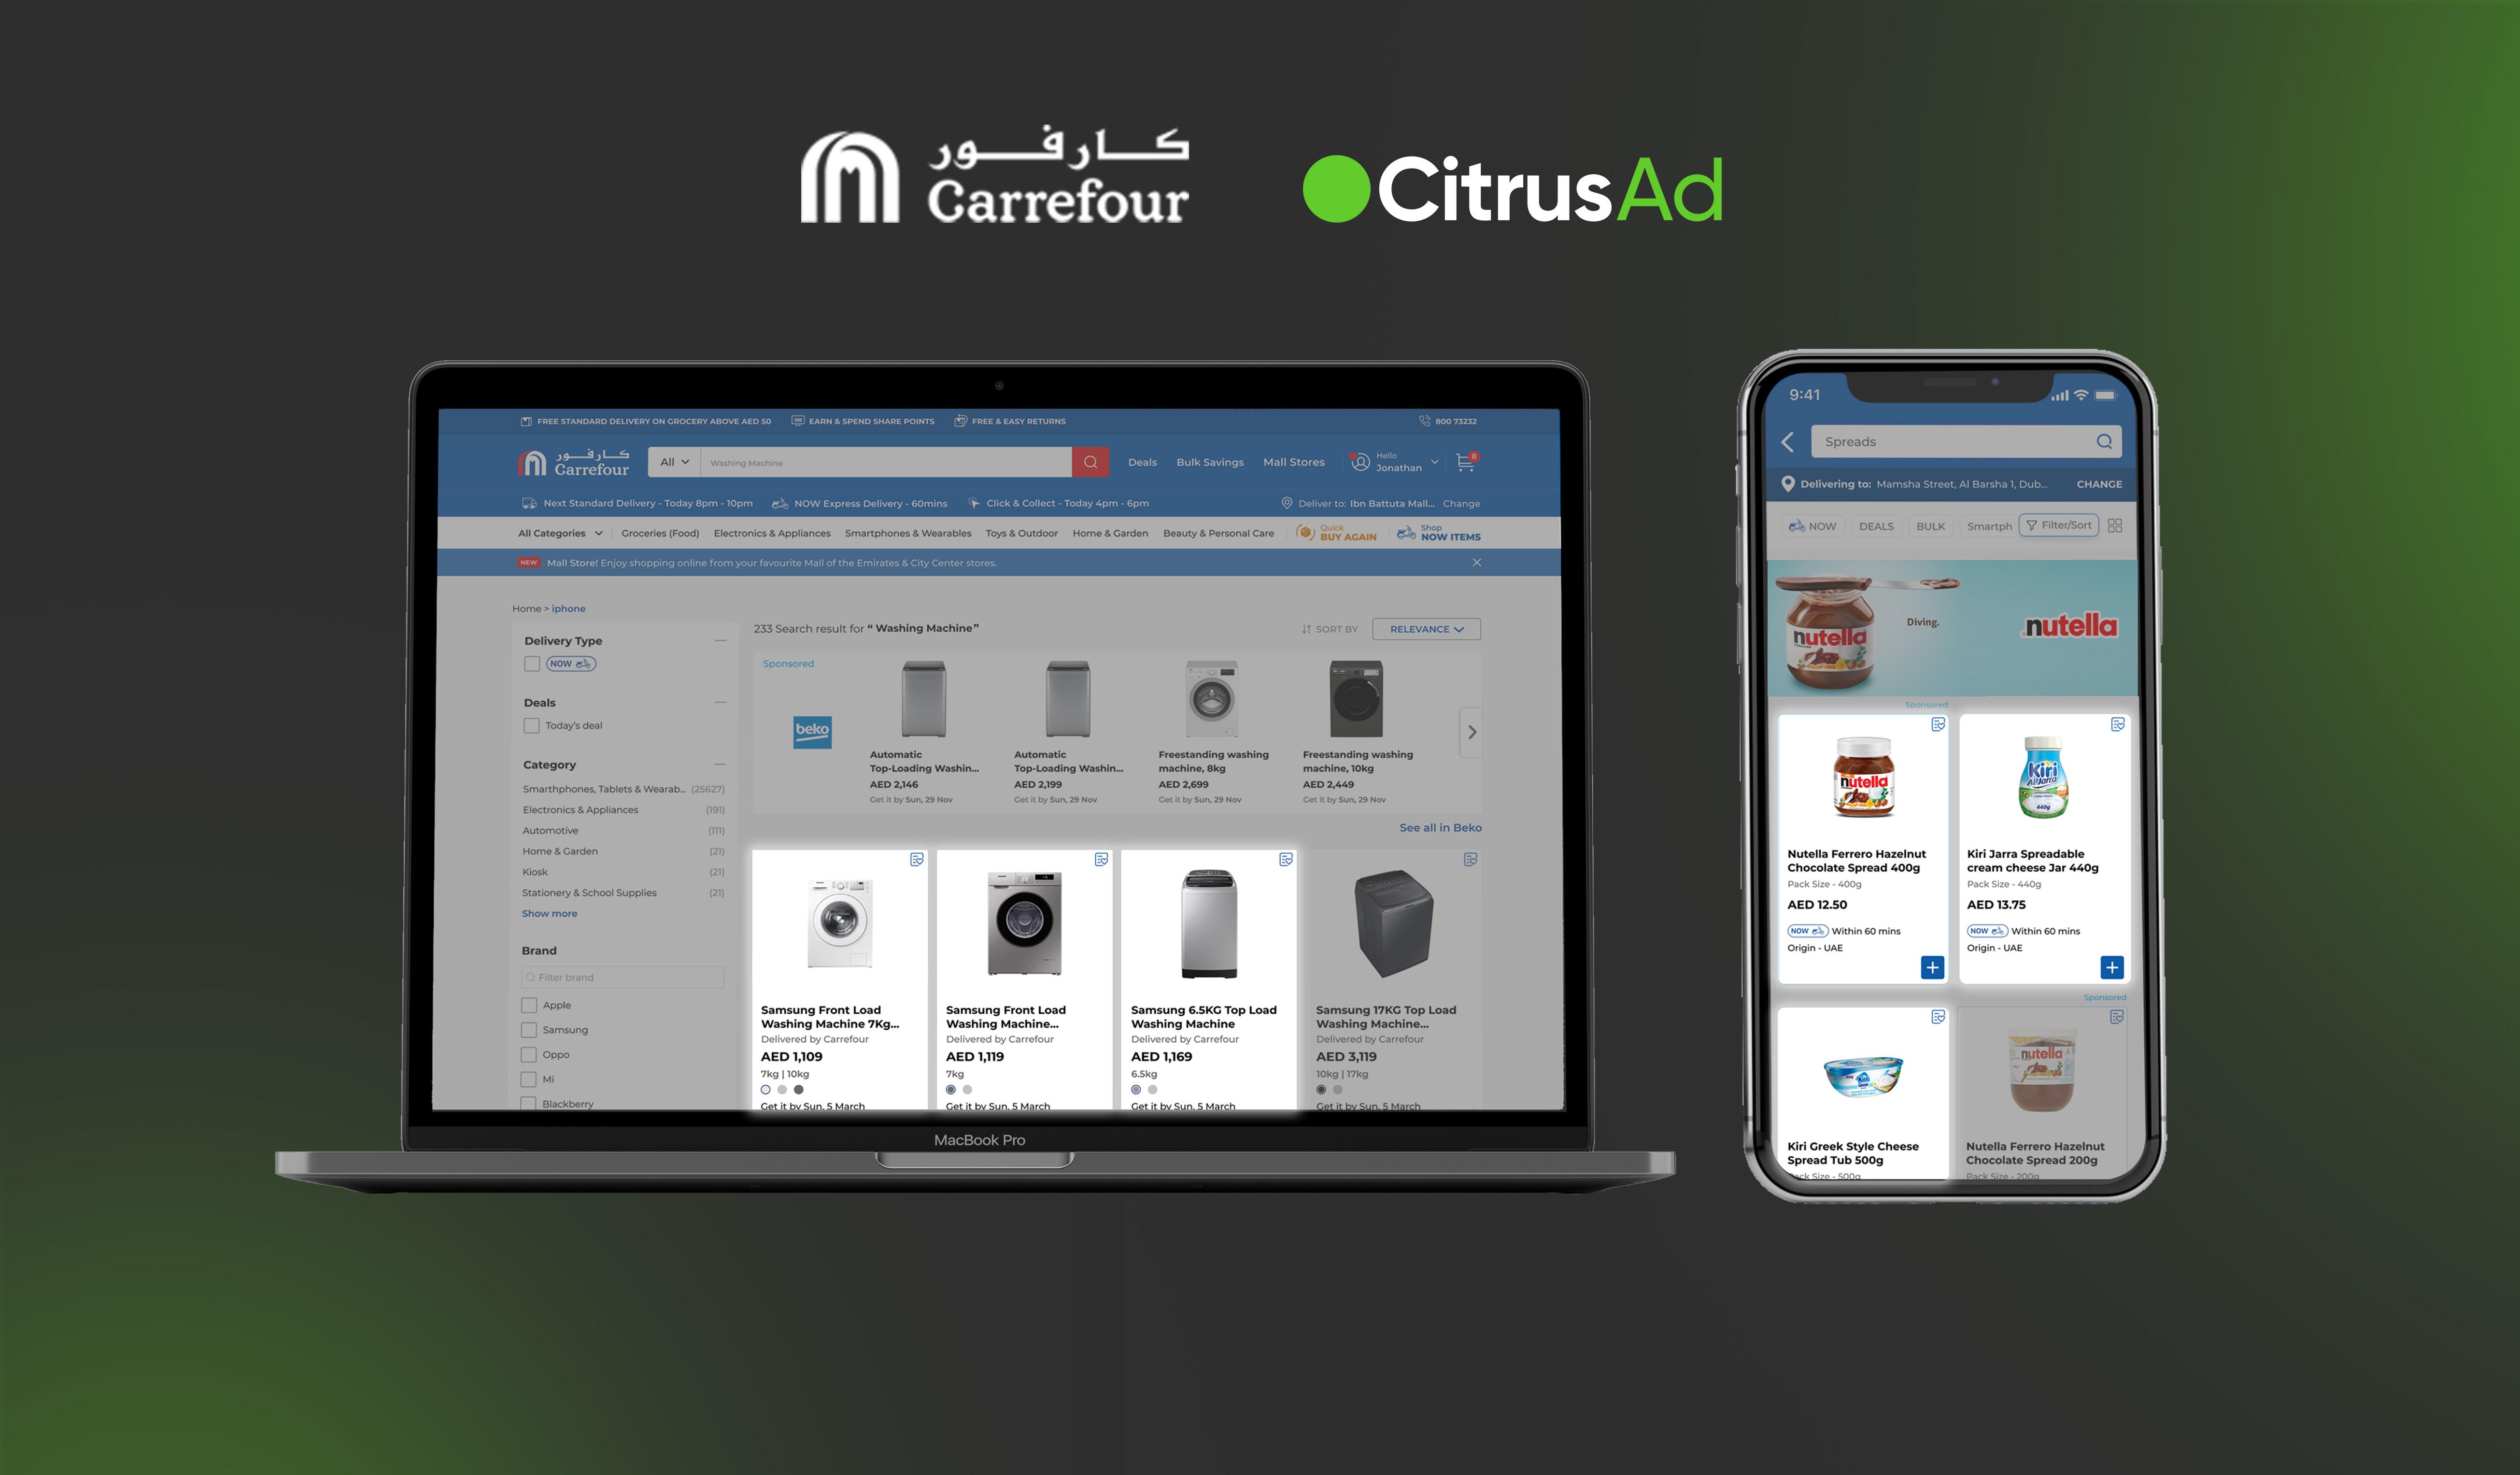 CitrusAd Carrefour platform 1627454718 - Majid Al Futtaim Chooses CitrusAd as its Retail Media Technology Platform